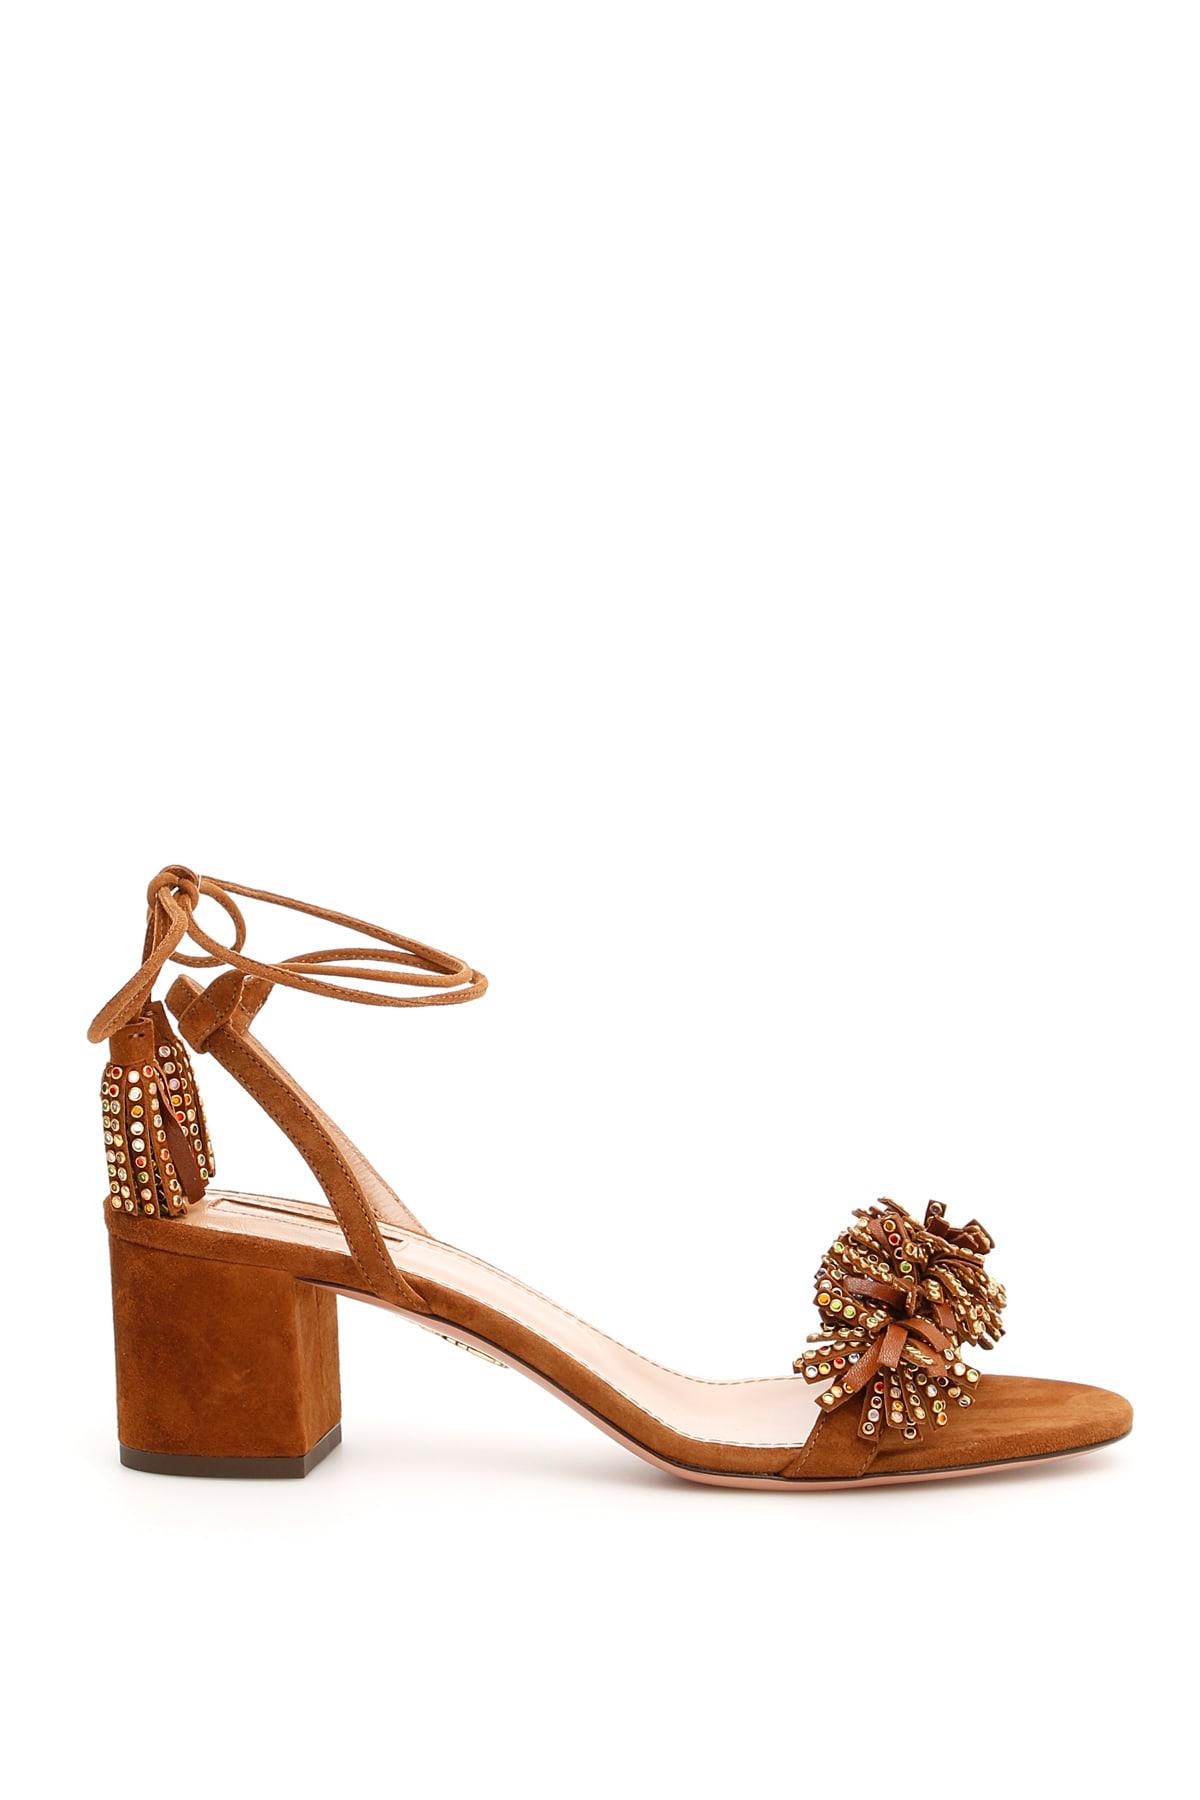 top brands differently outlet Aquazzura Aquazzura Wild Crystal Sandals 50 - CINNAMON ...